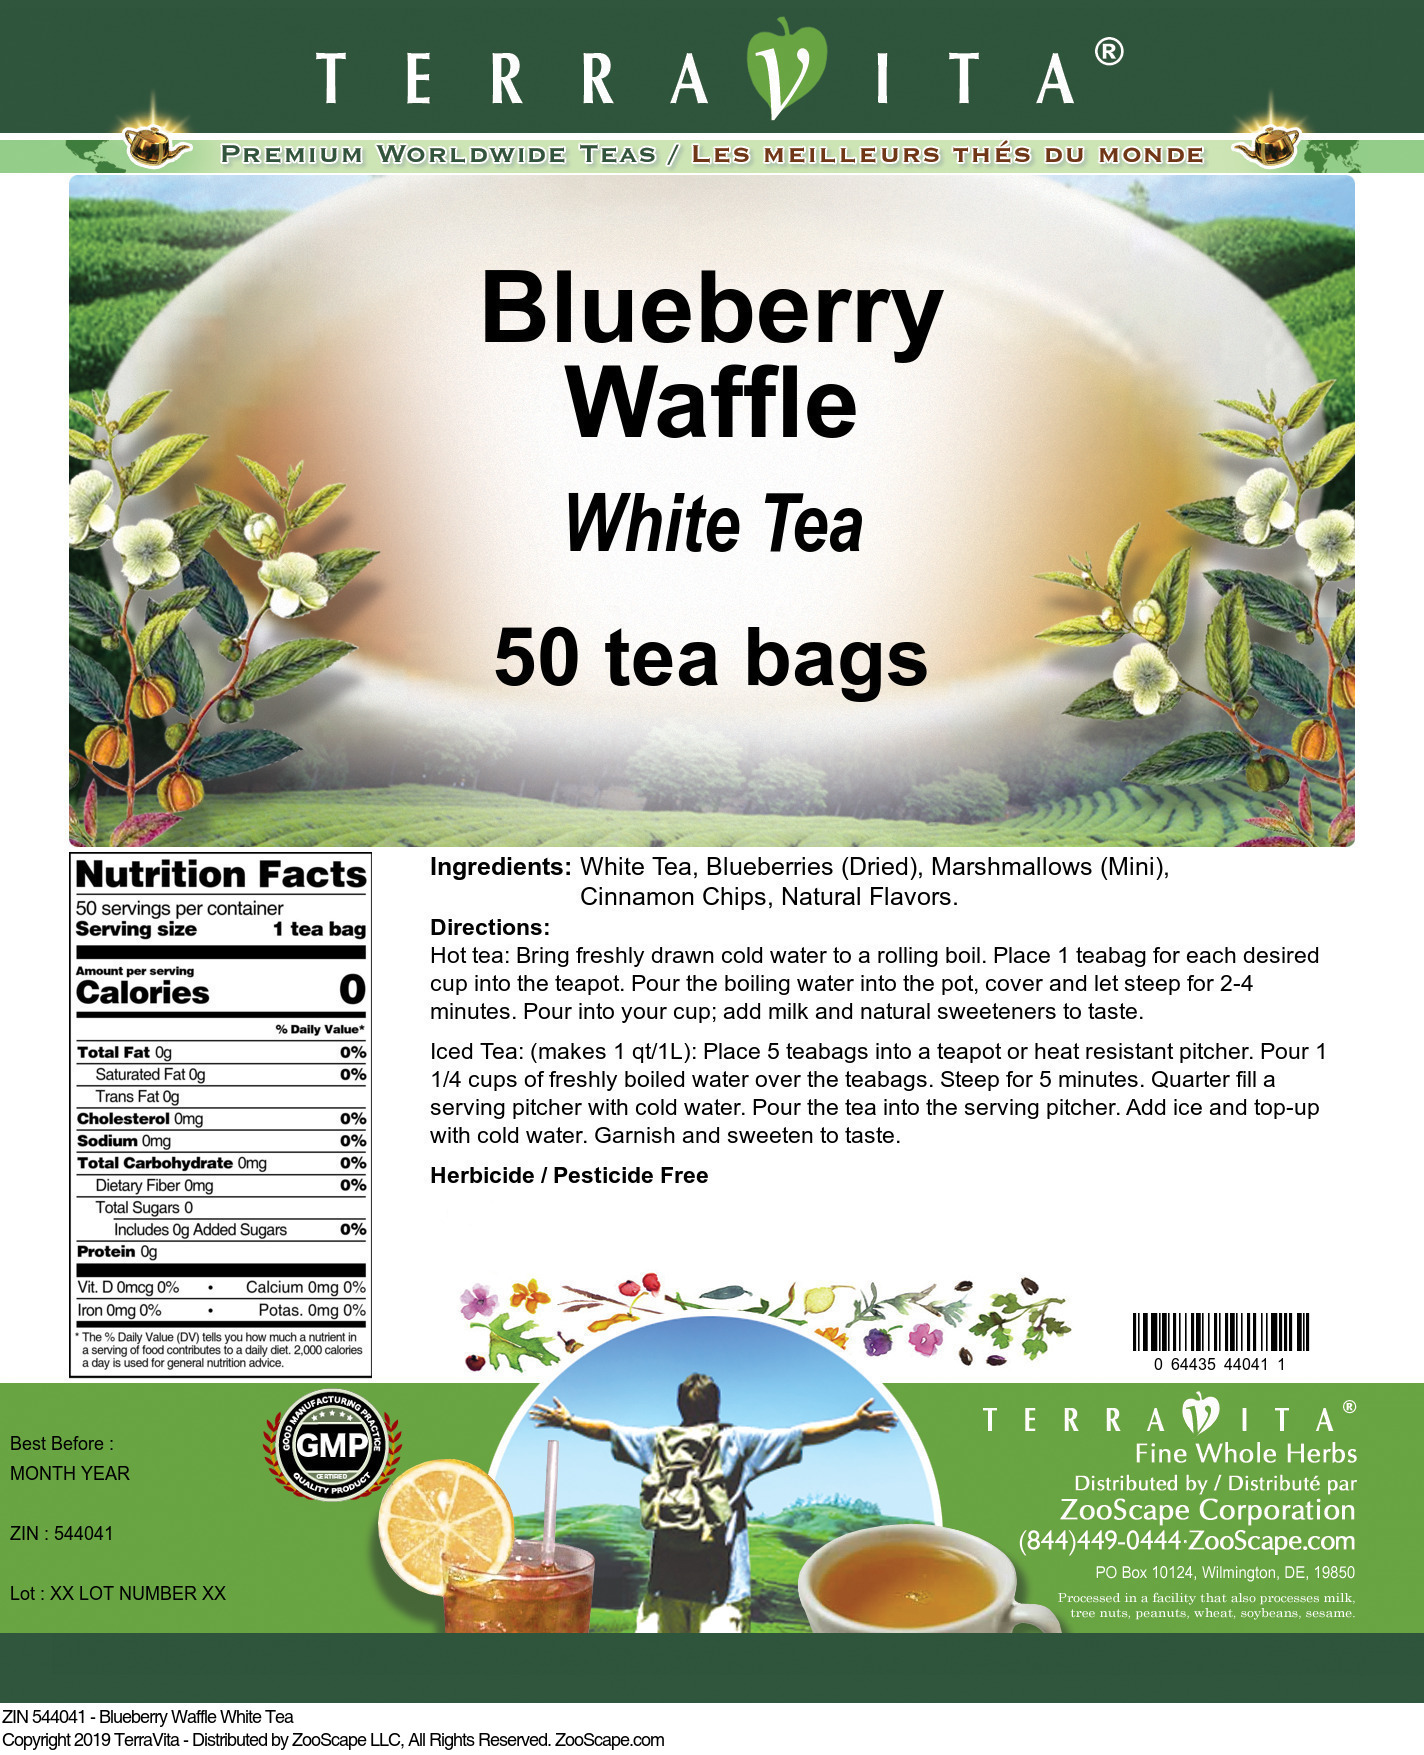 Blueberry Waffle White Tea